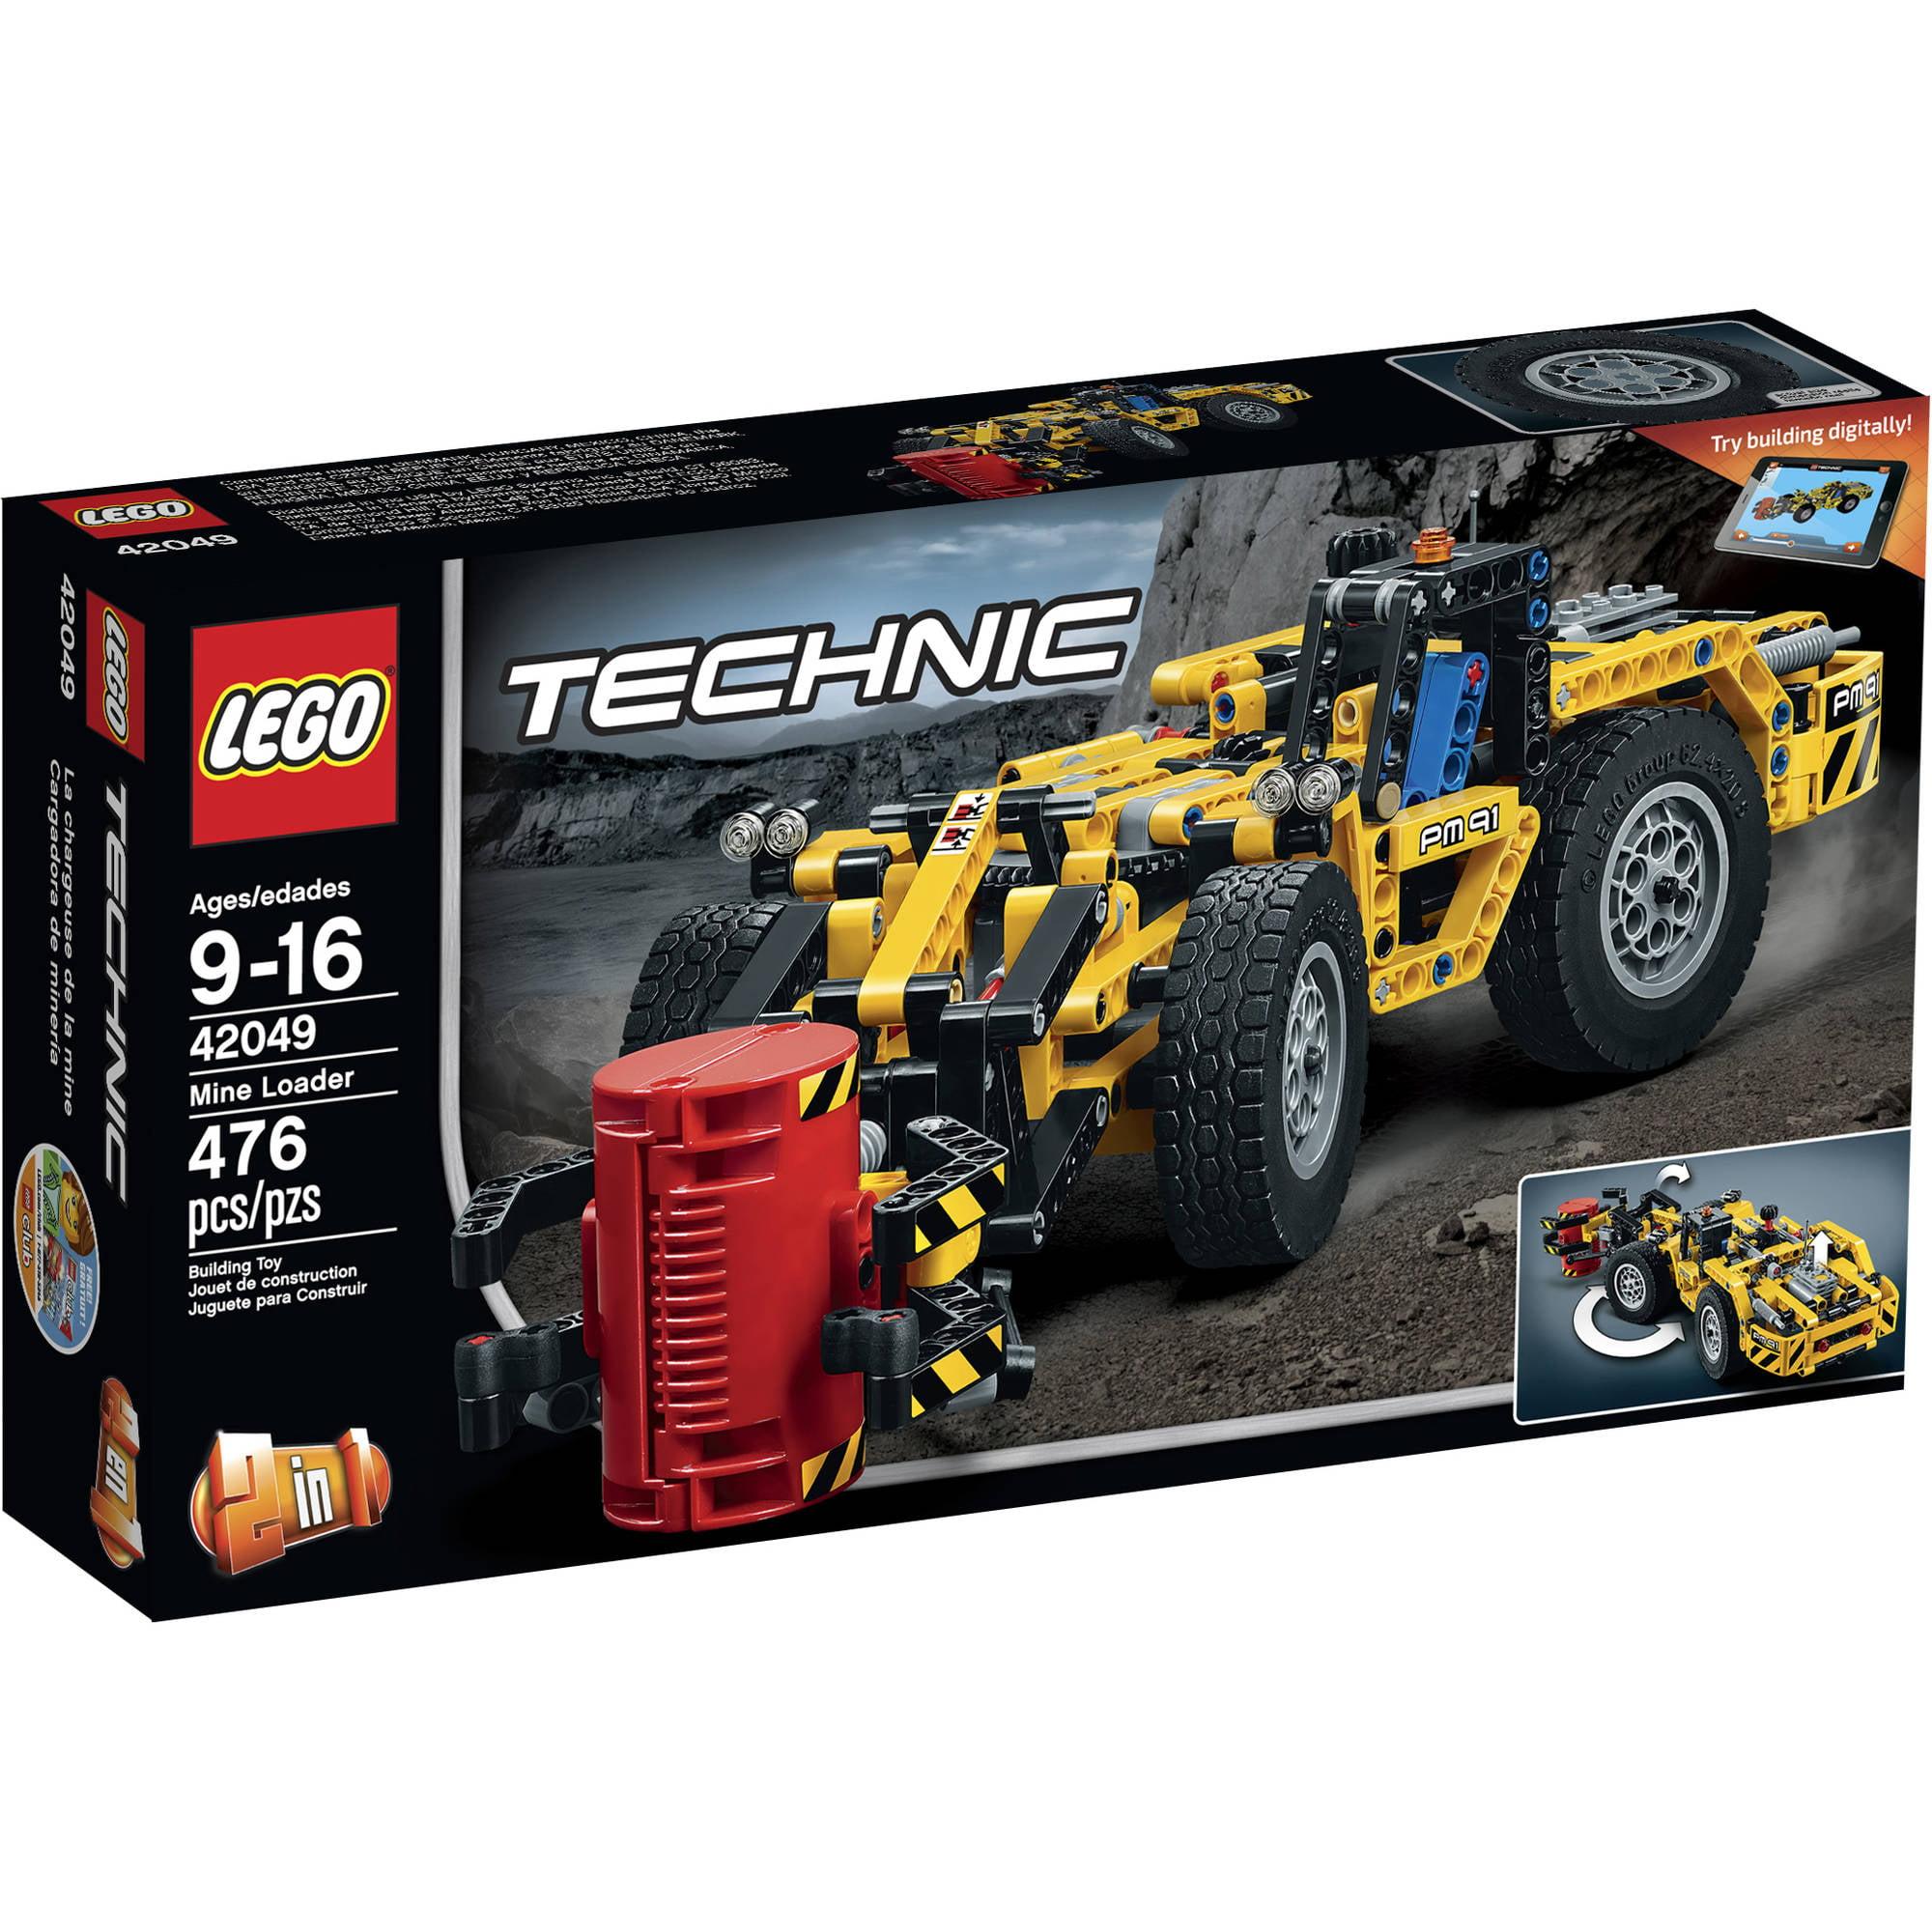 LEGO Technic Mine Loader, 42049